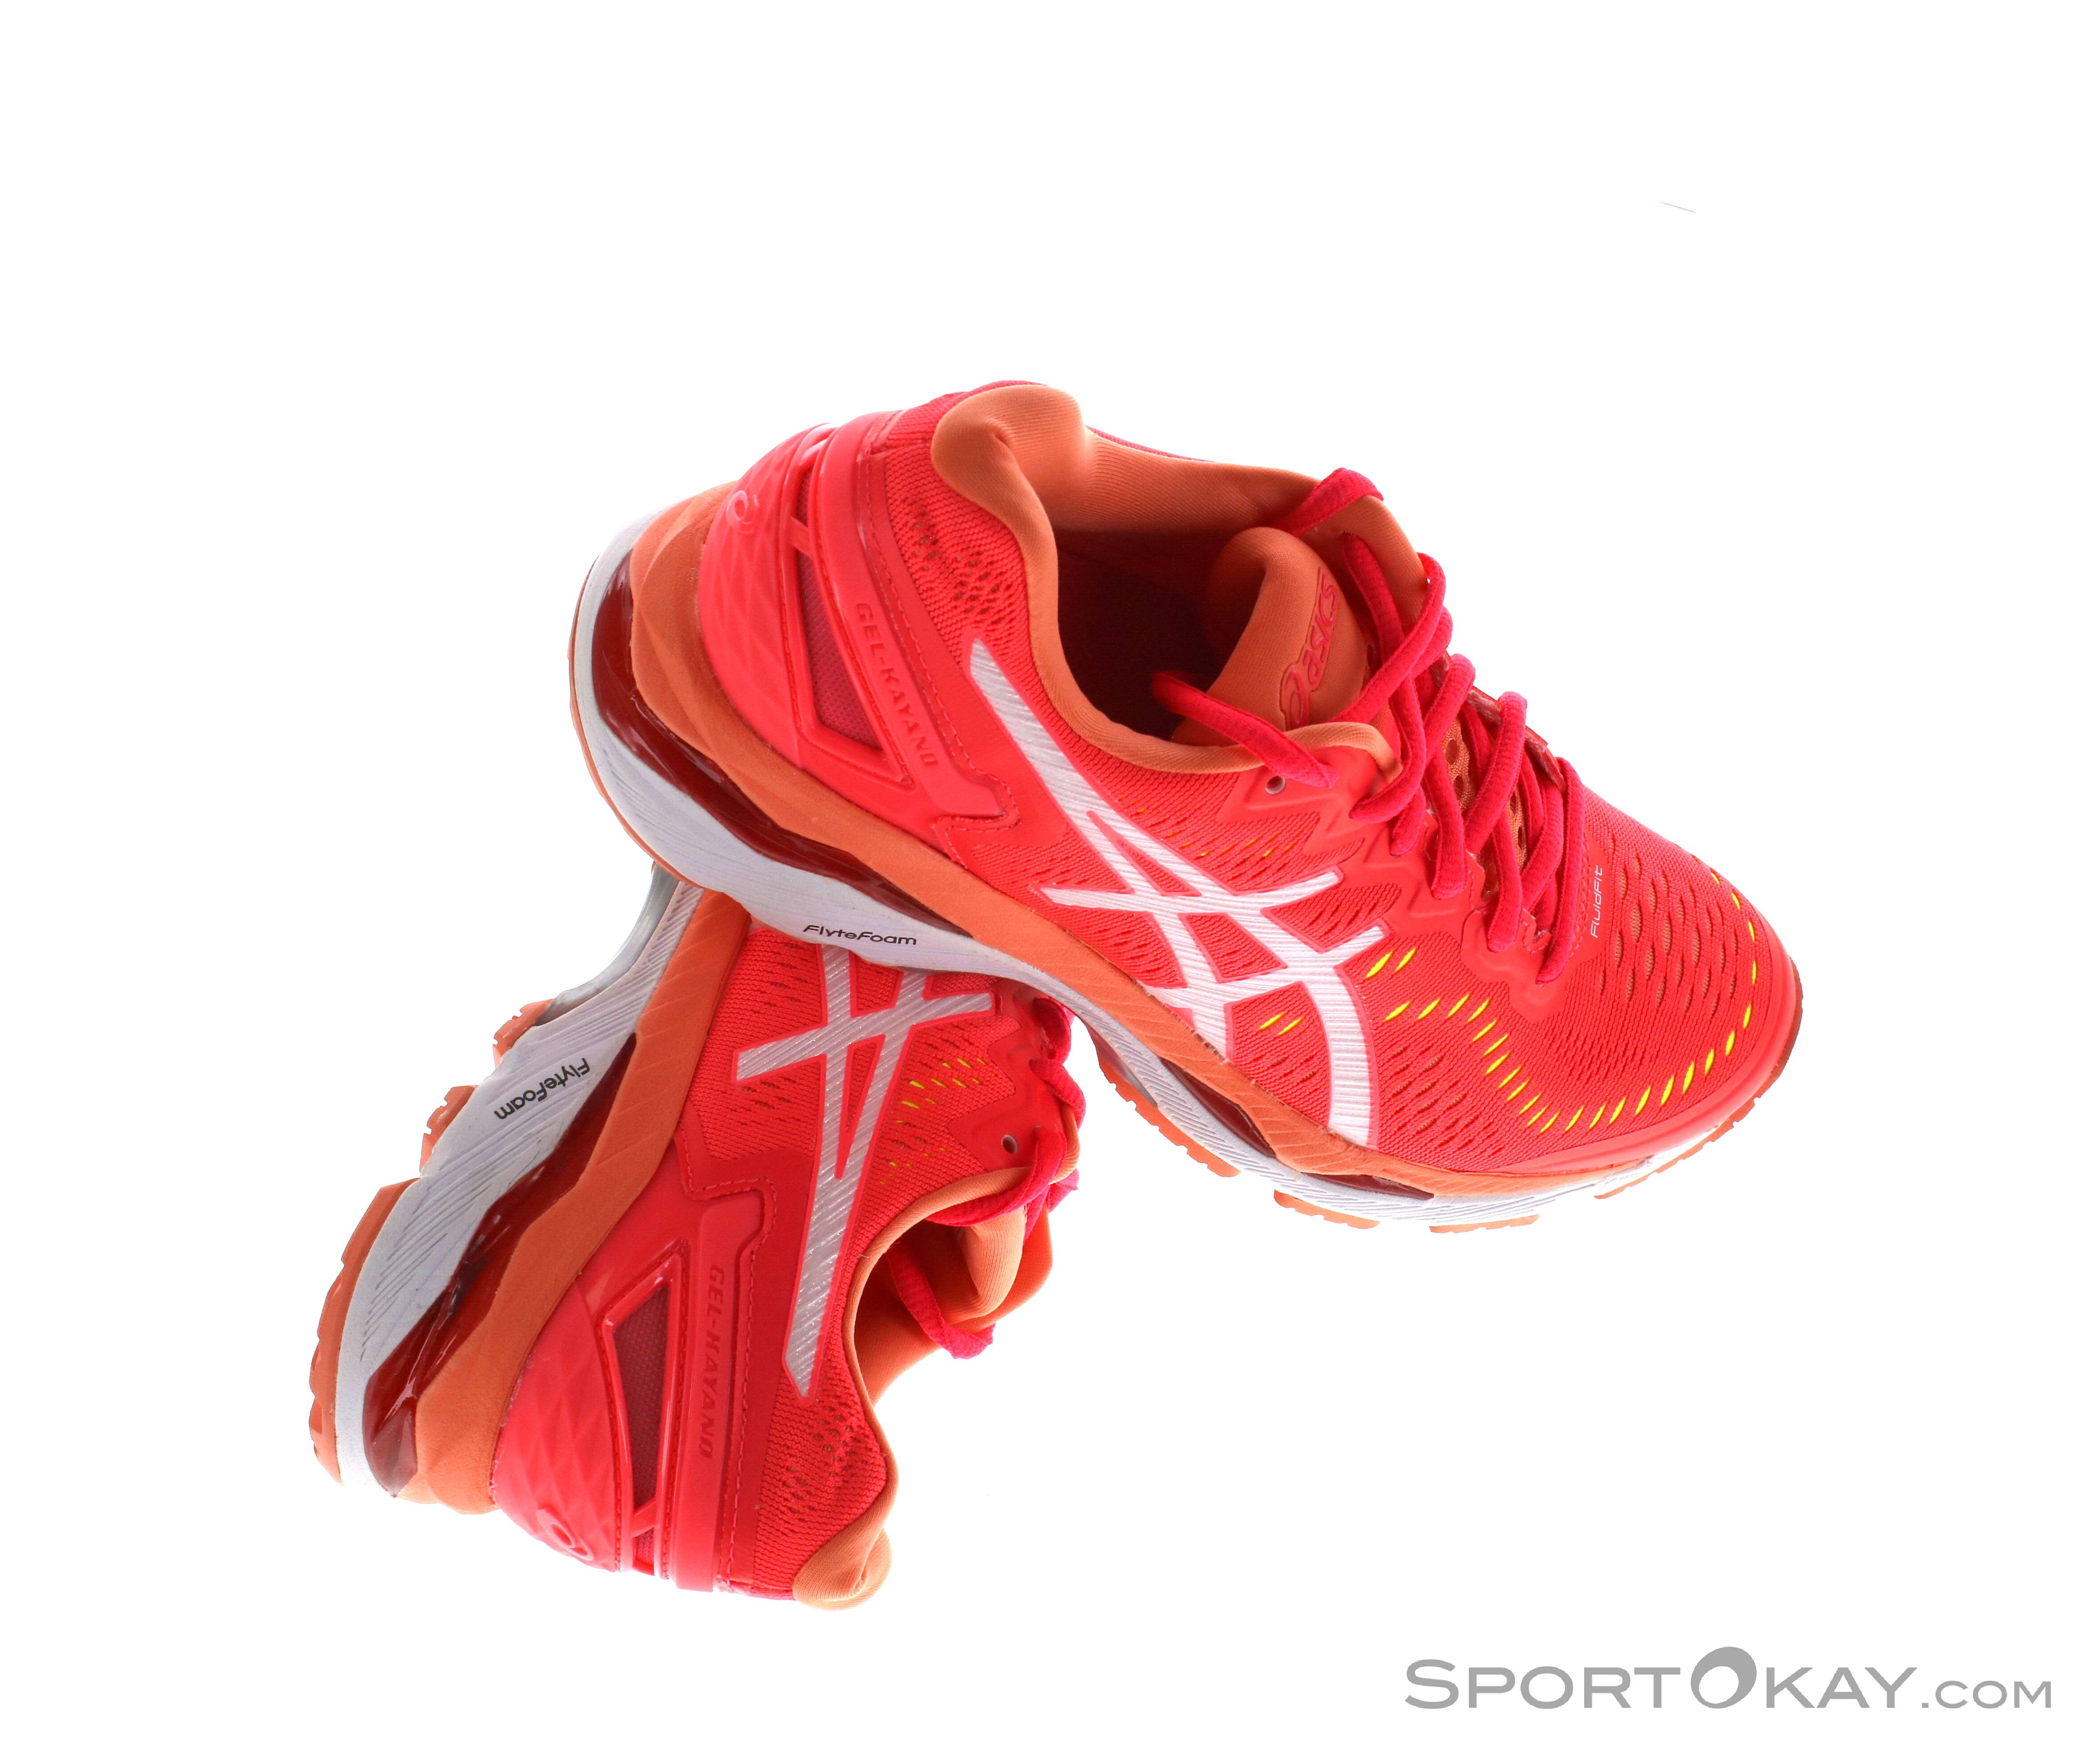 Asics Gel-Kayano 23 Women Damen Schuhe Laufschuhe Running Sneaker T696N-2001